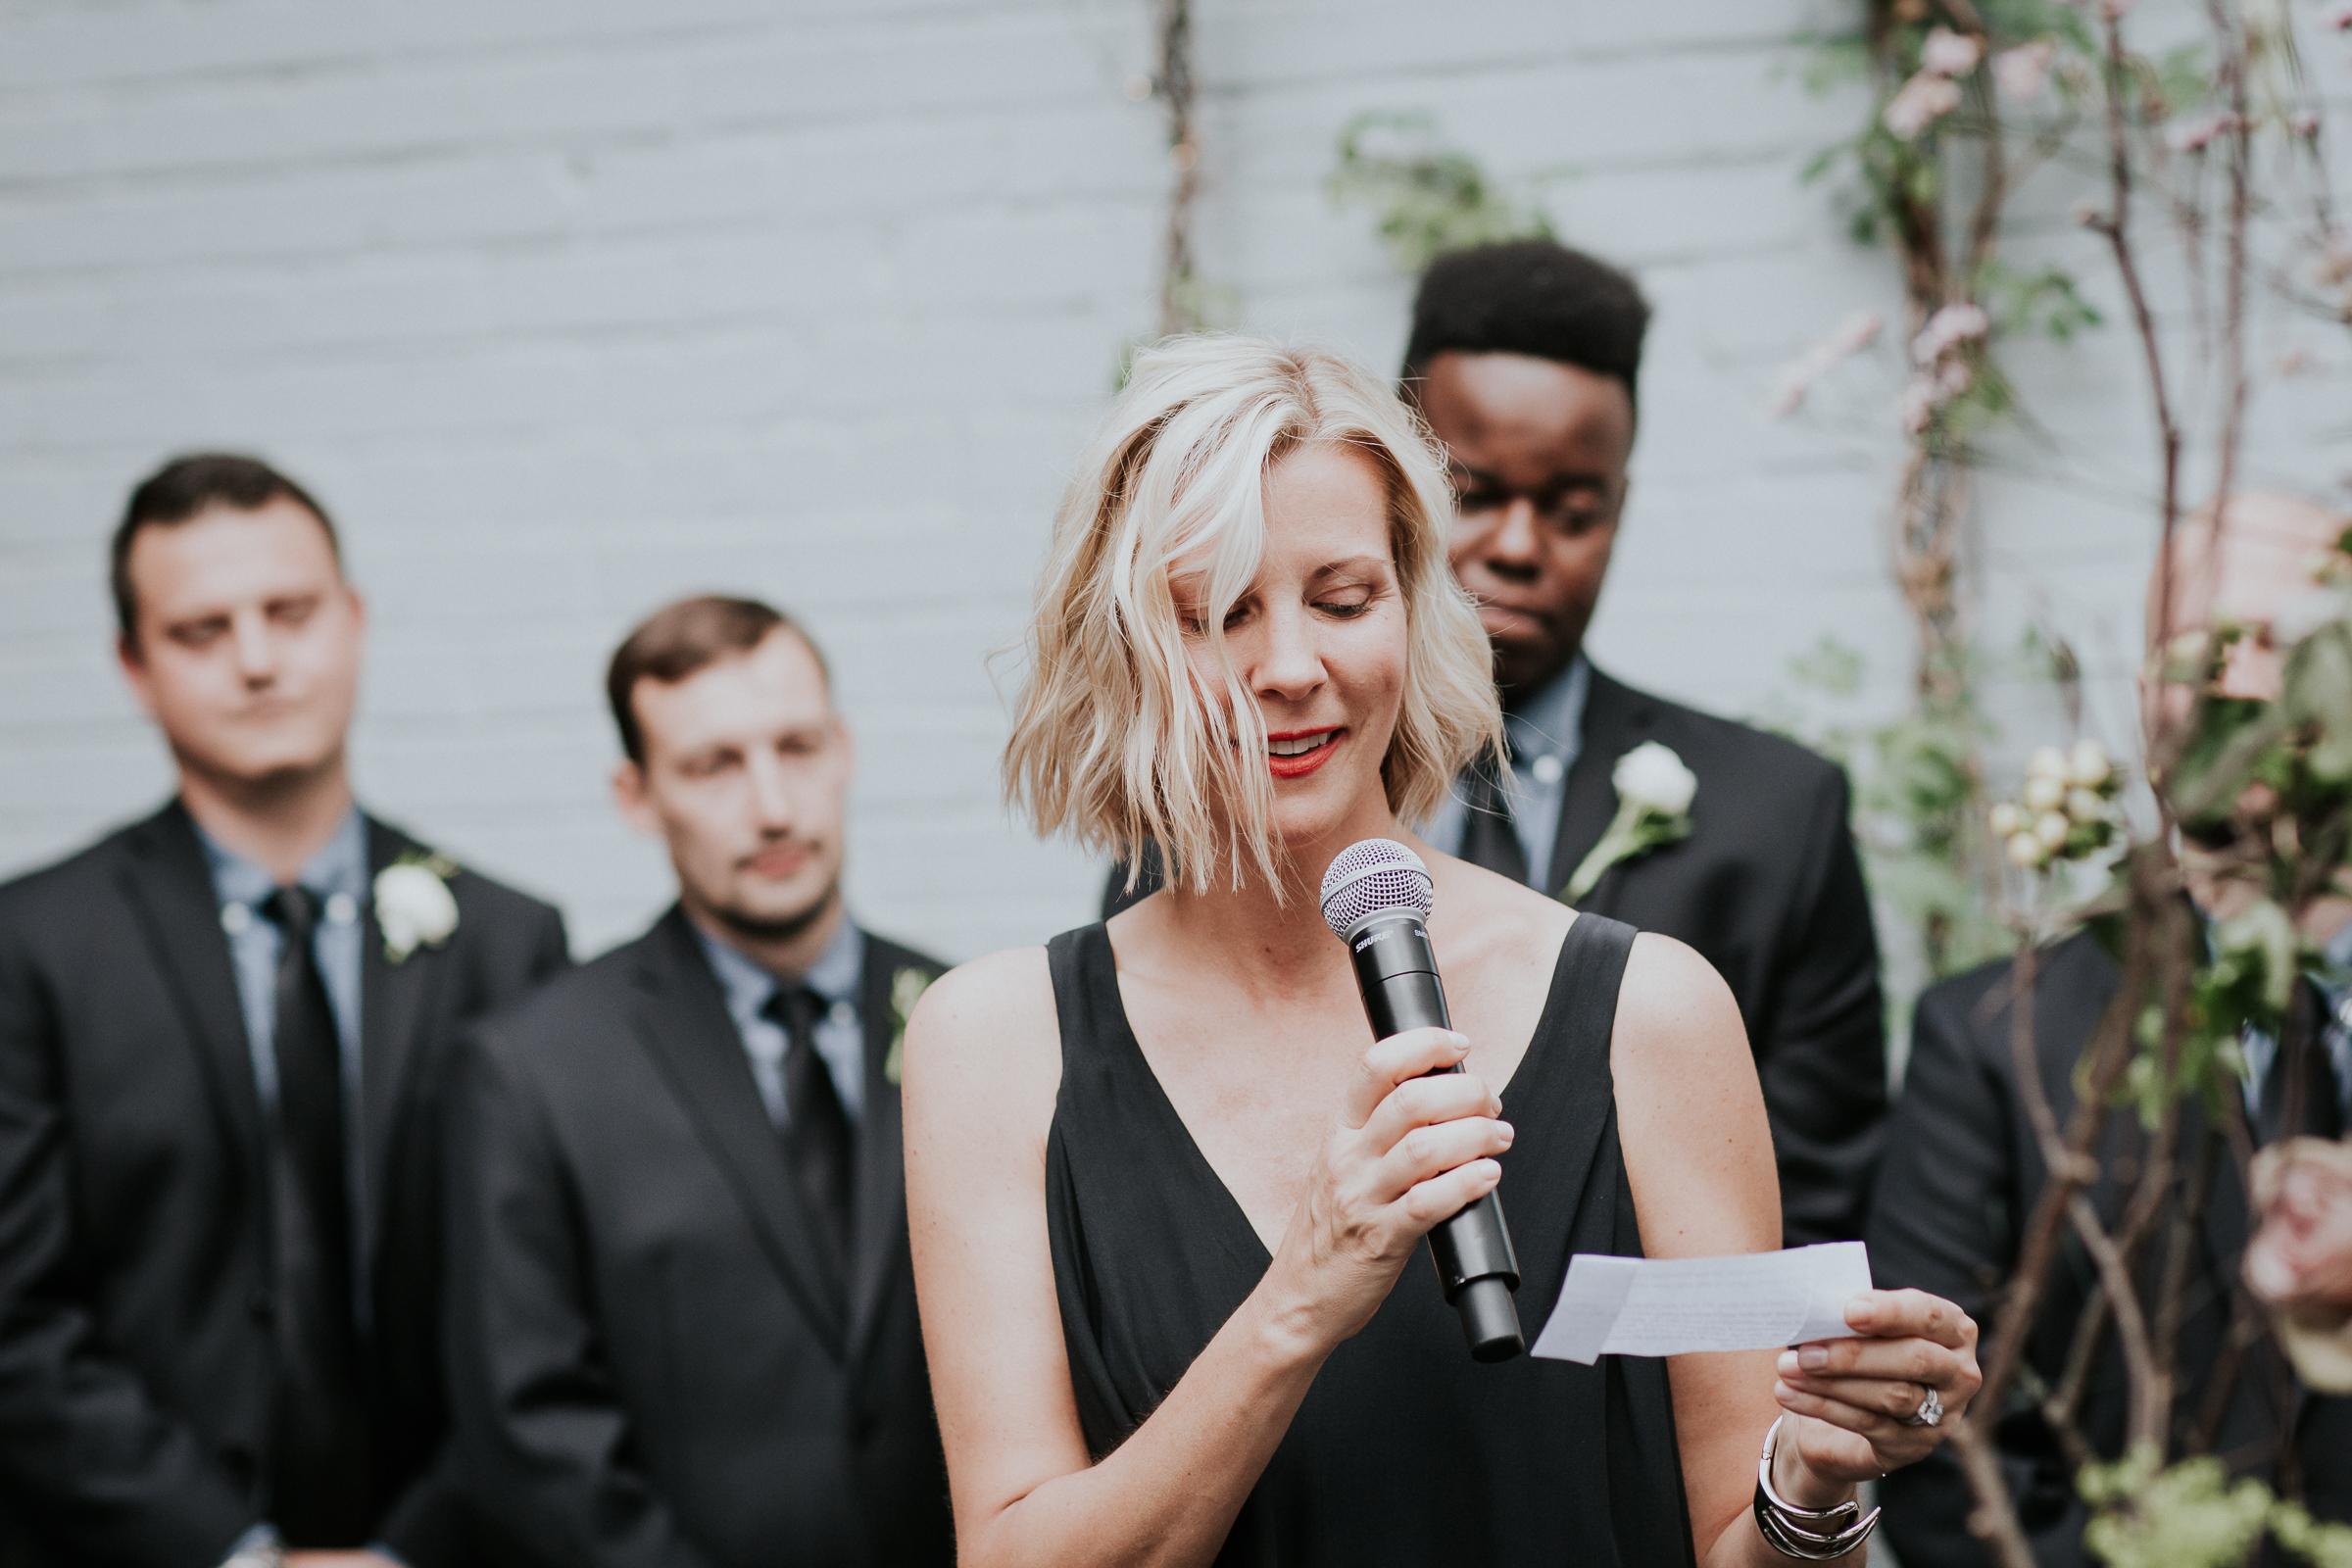 501-Union-Brooklyn-Fine-Art-Documentary-Wedding-Photographer-89.jpg